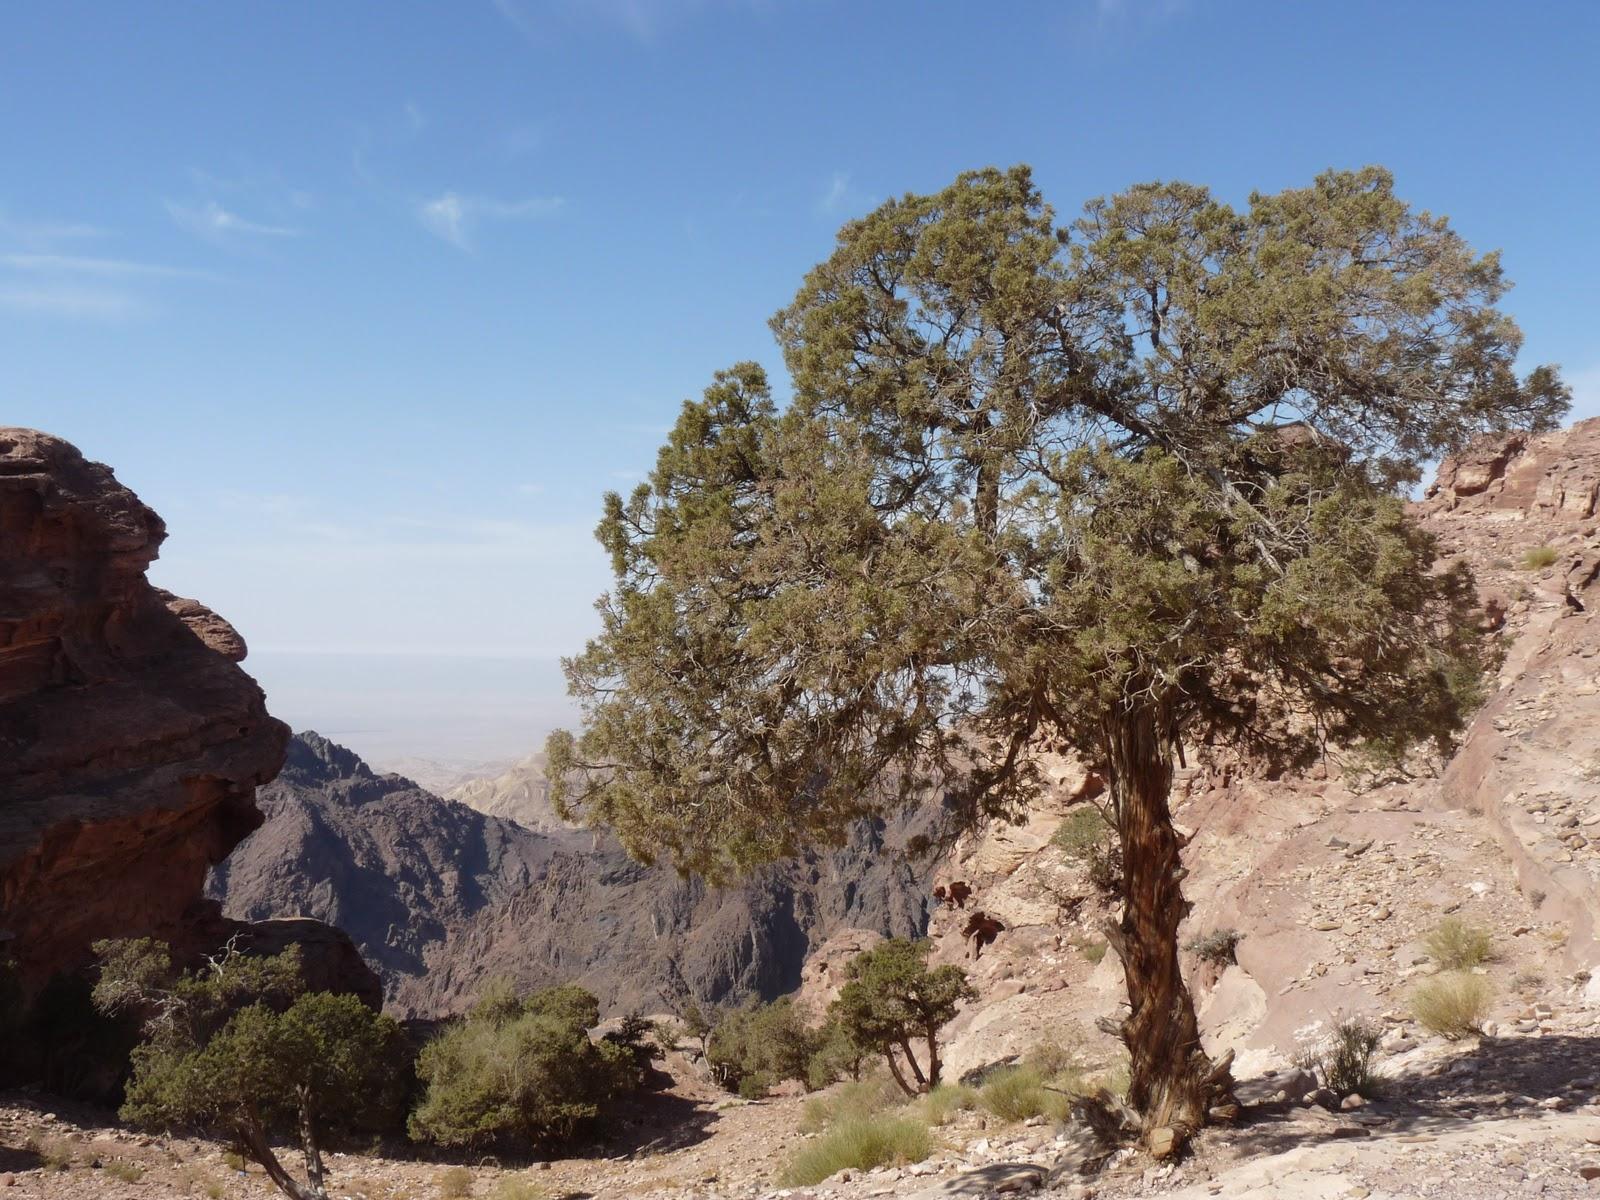 Pension lawyer meets world: Petra, Wadi Rum and Aqaba